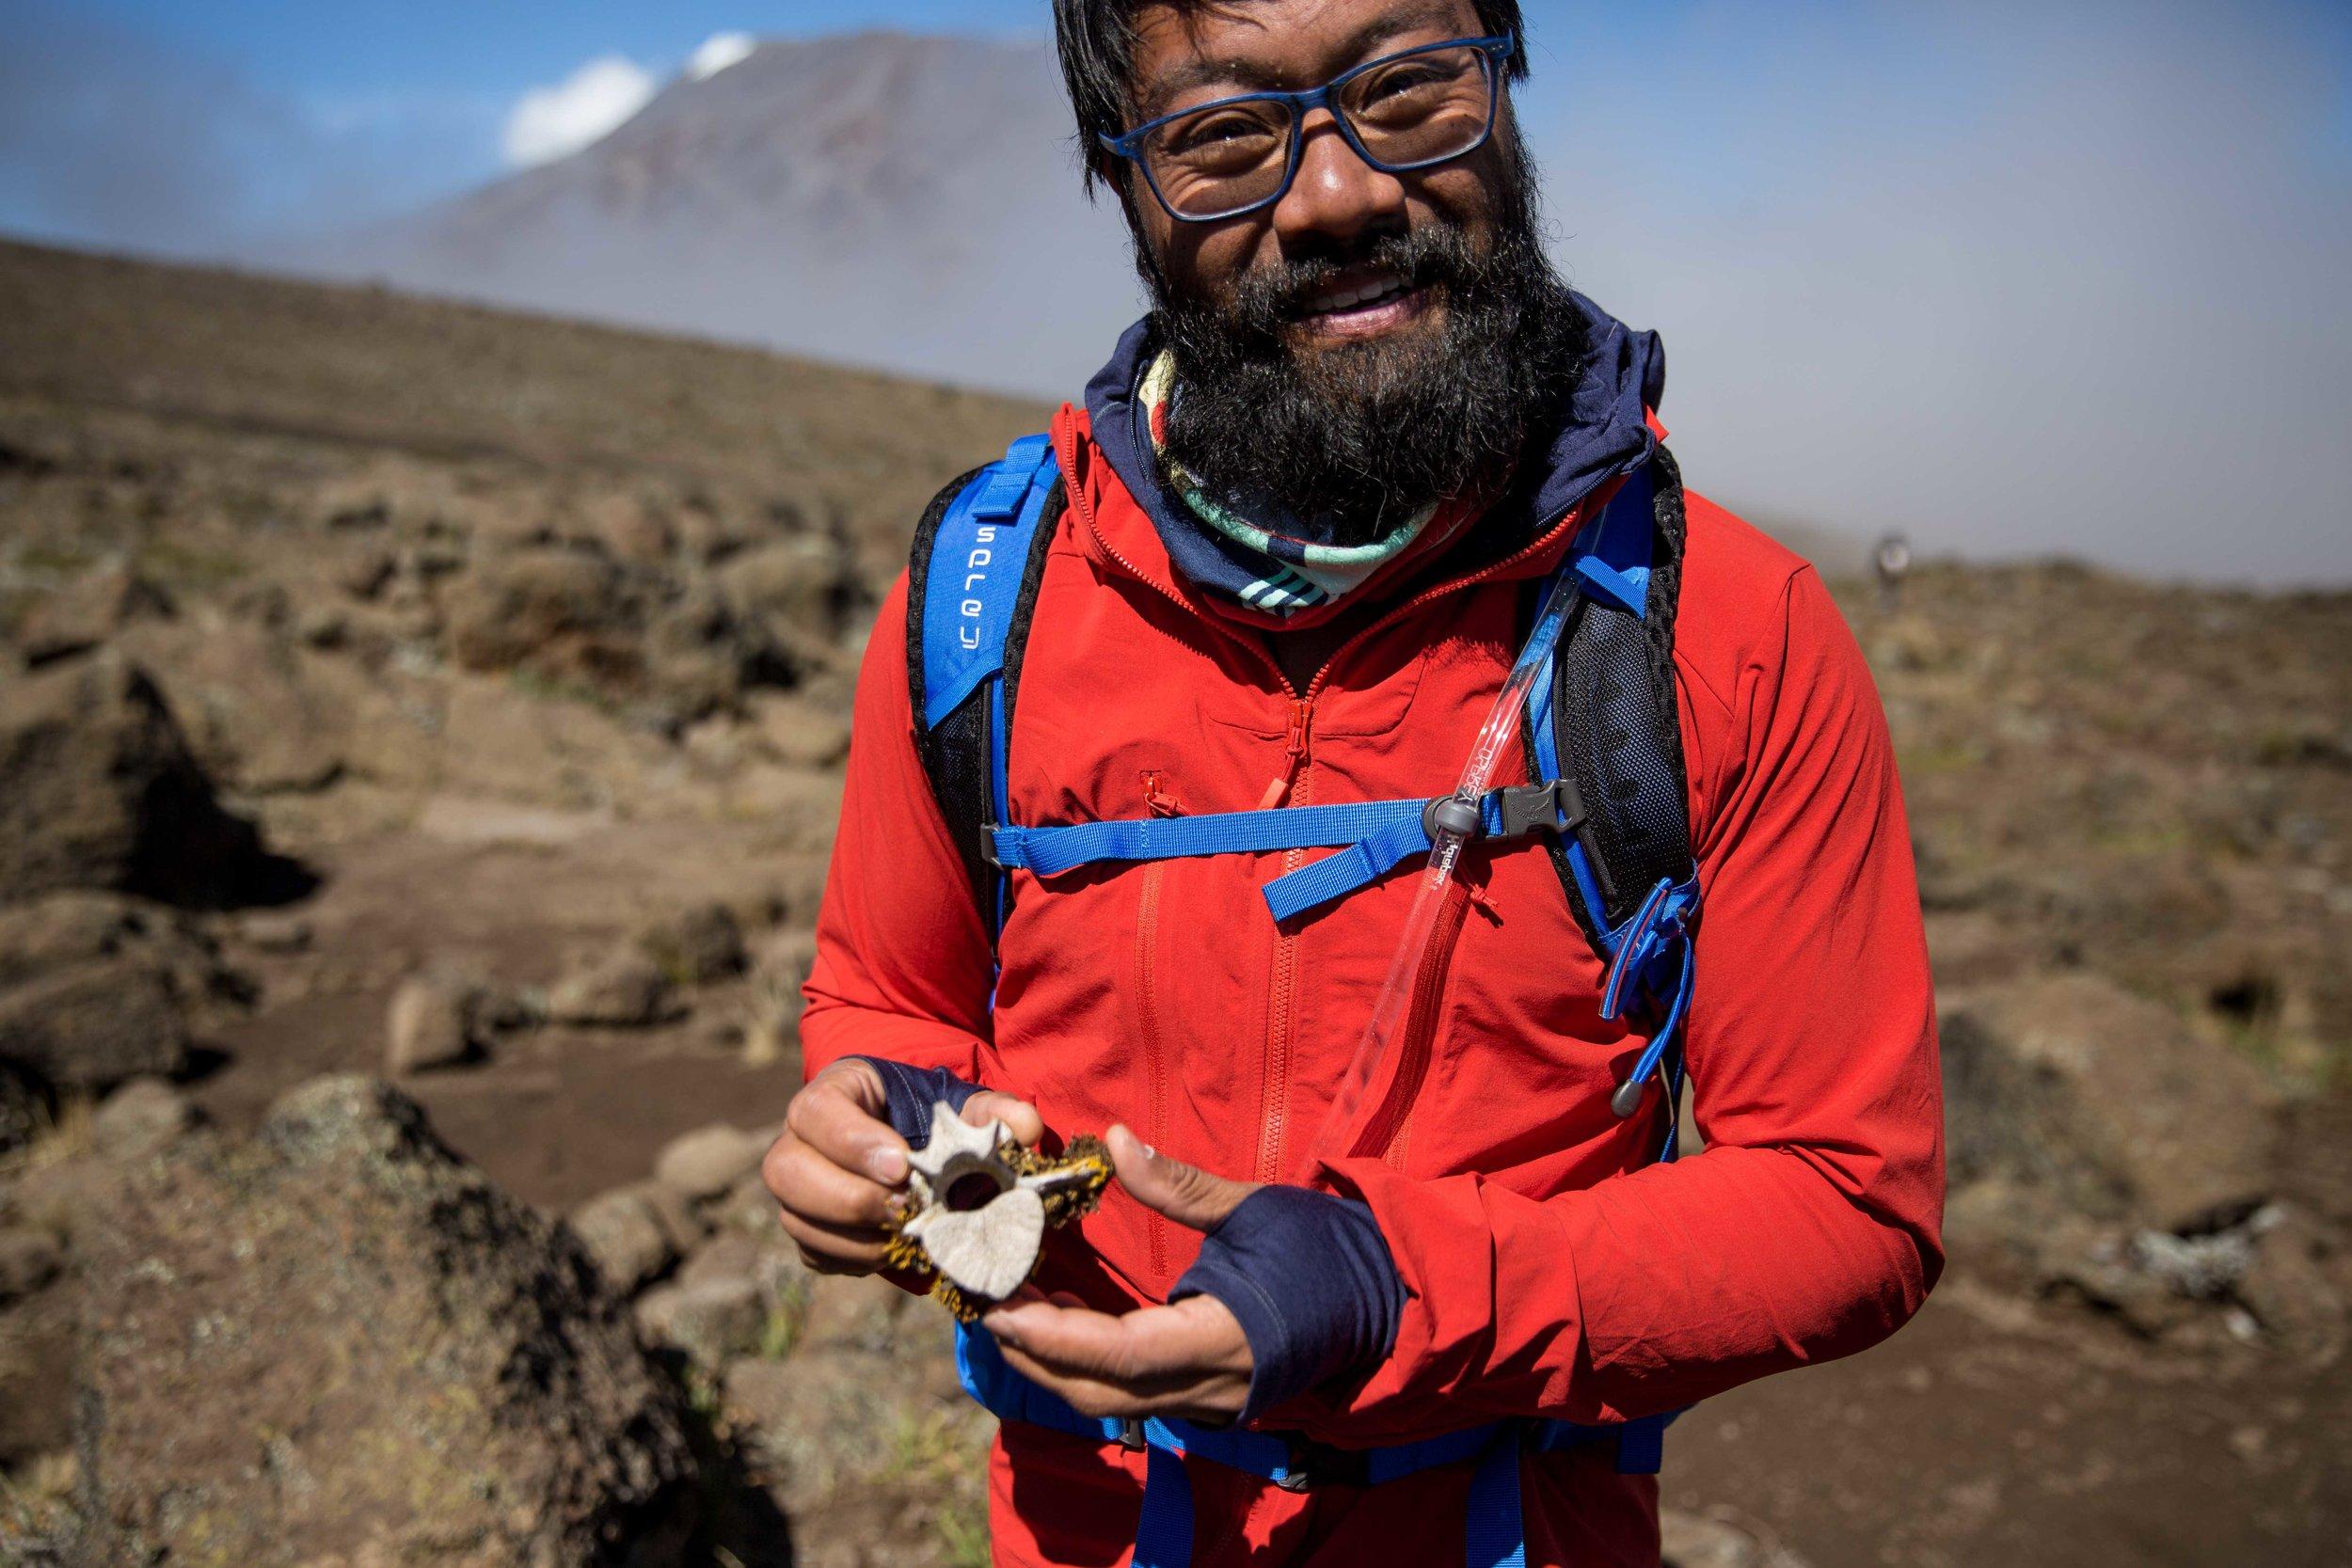 ajw_REI_Kilimanjaro-34.jpg